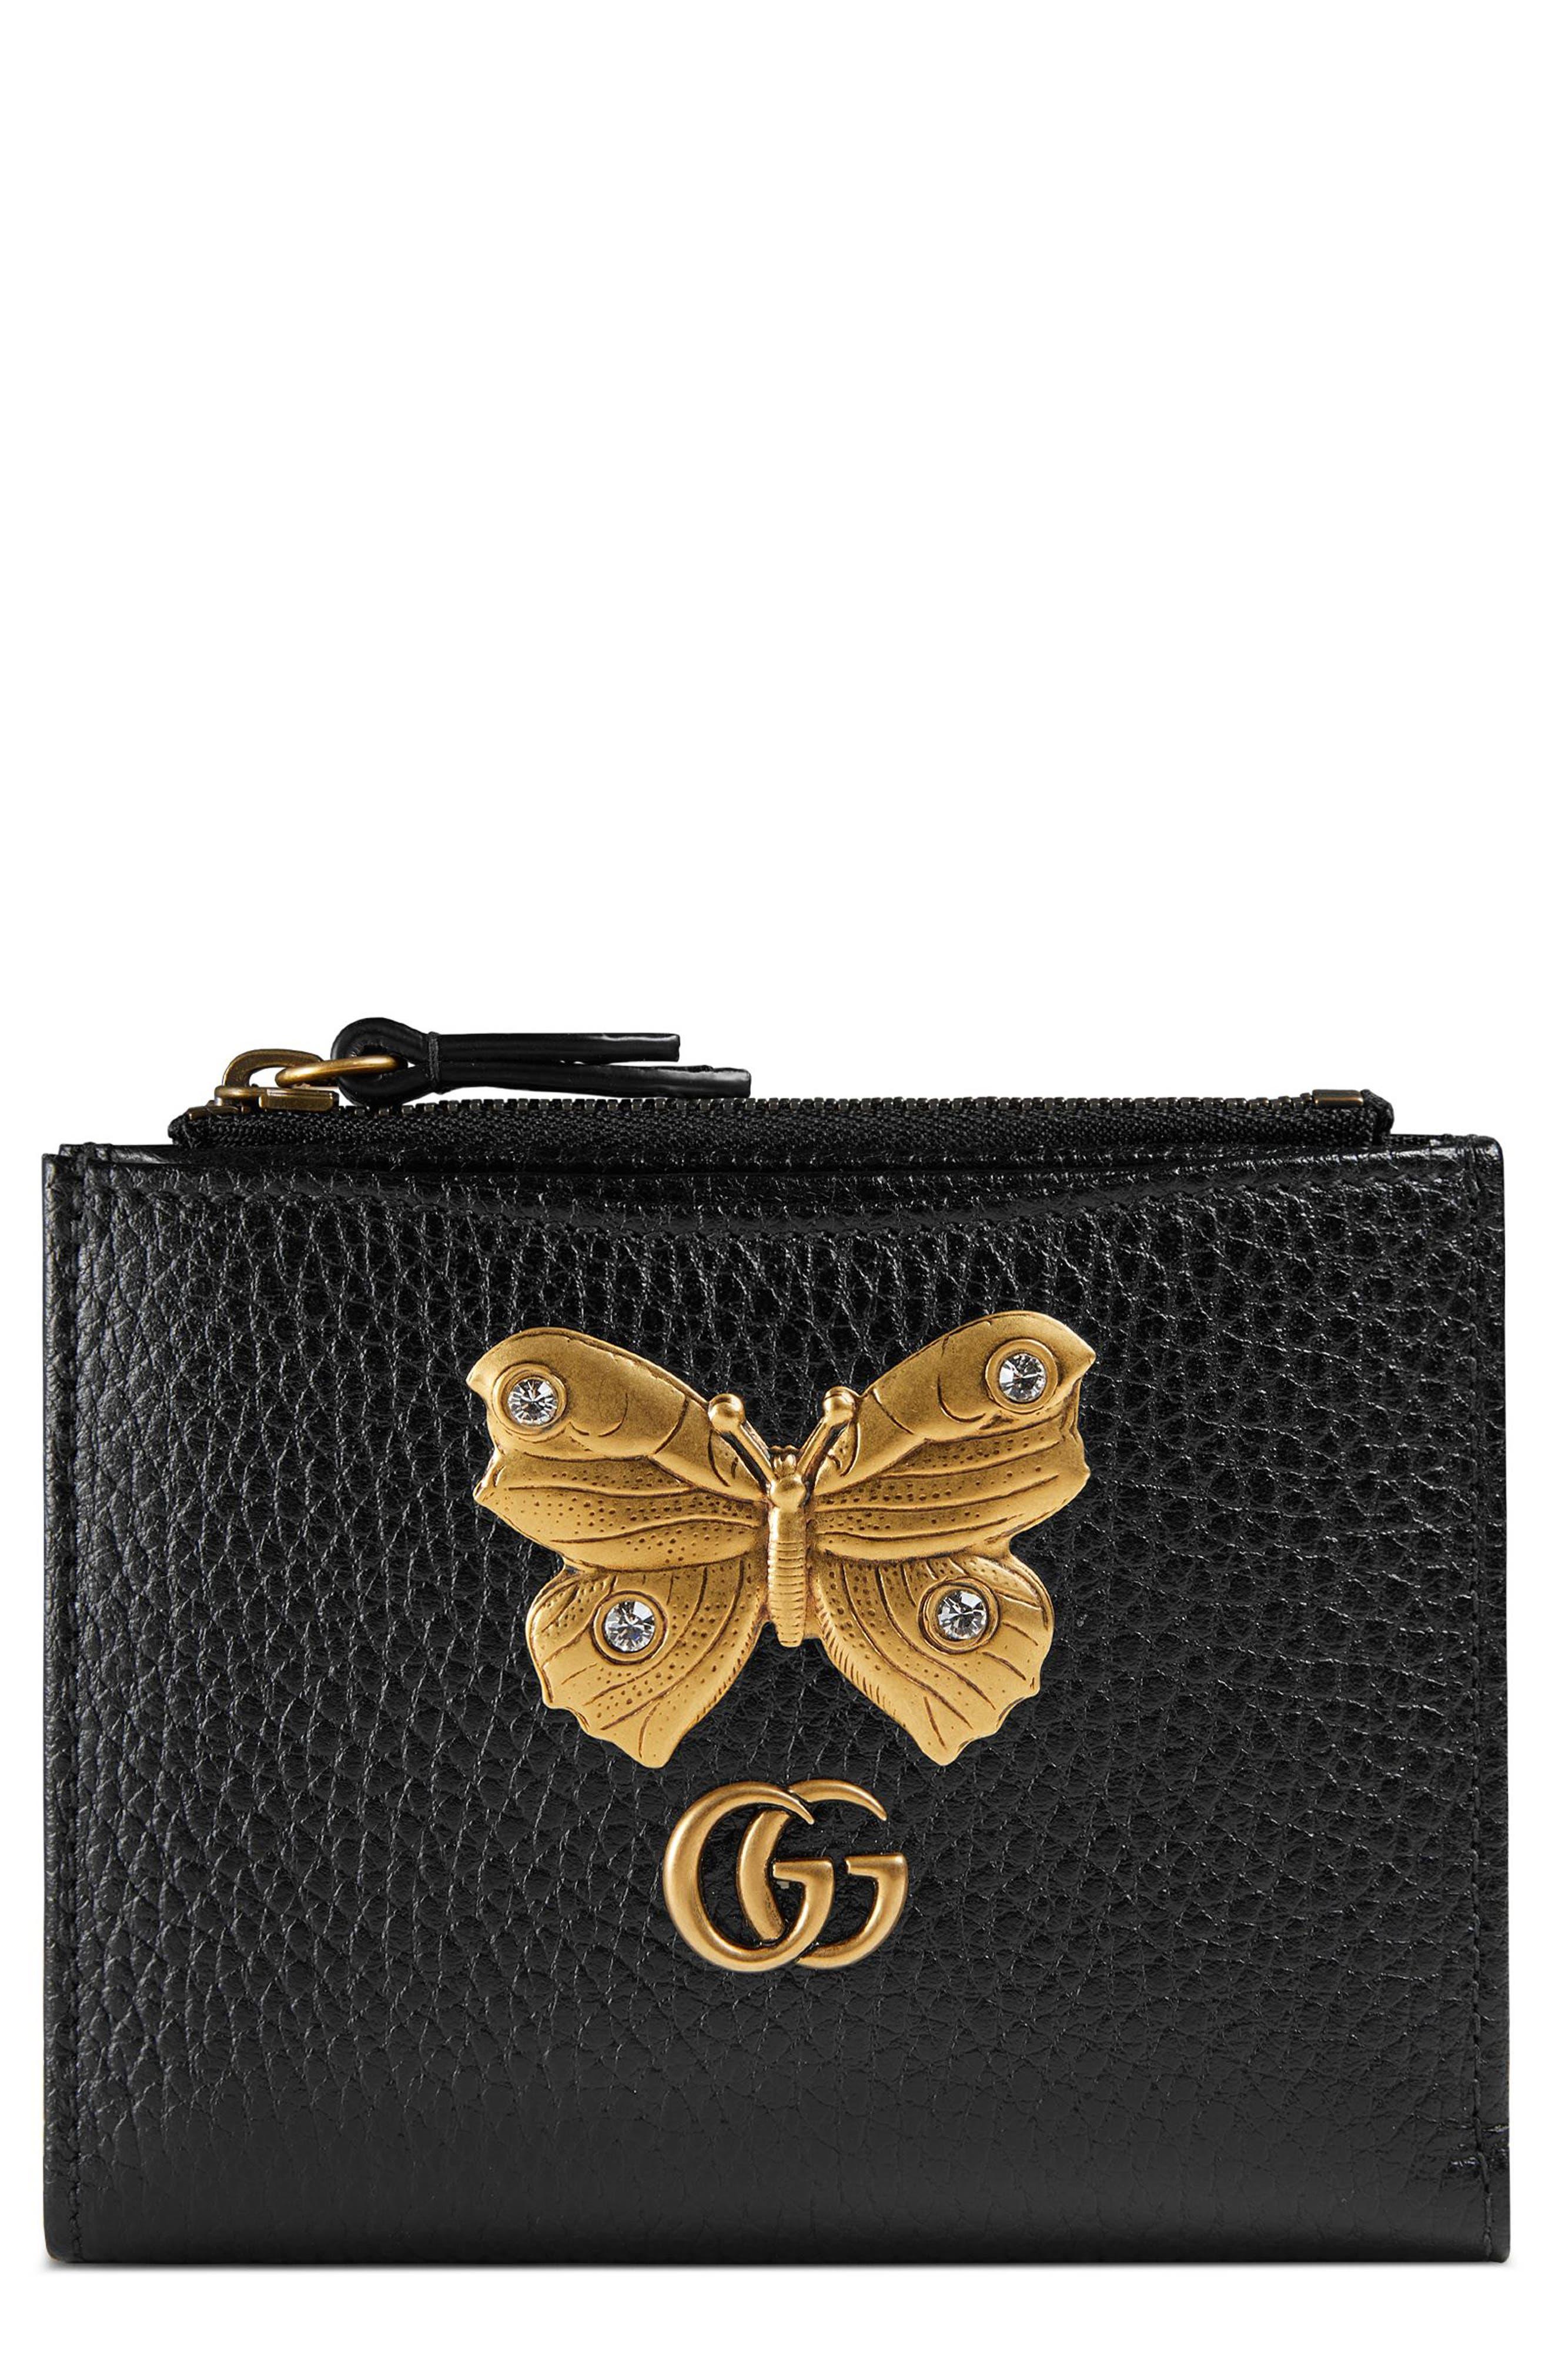 Farfalla Leather Wallet,                         Main,                         color, NERO/ CRYSTAL